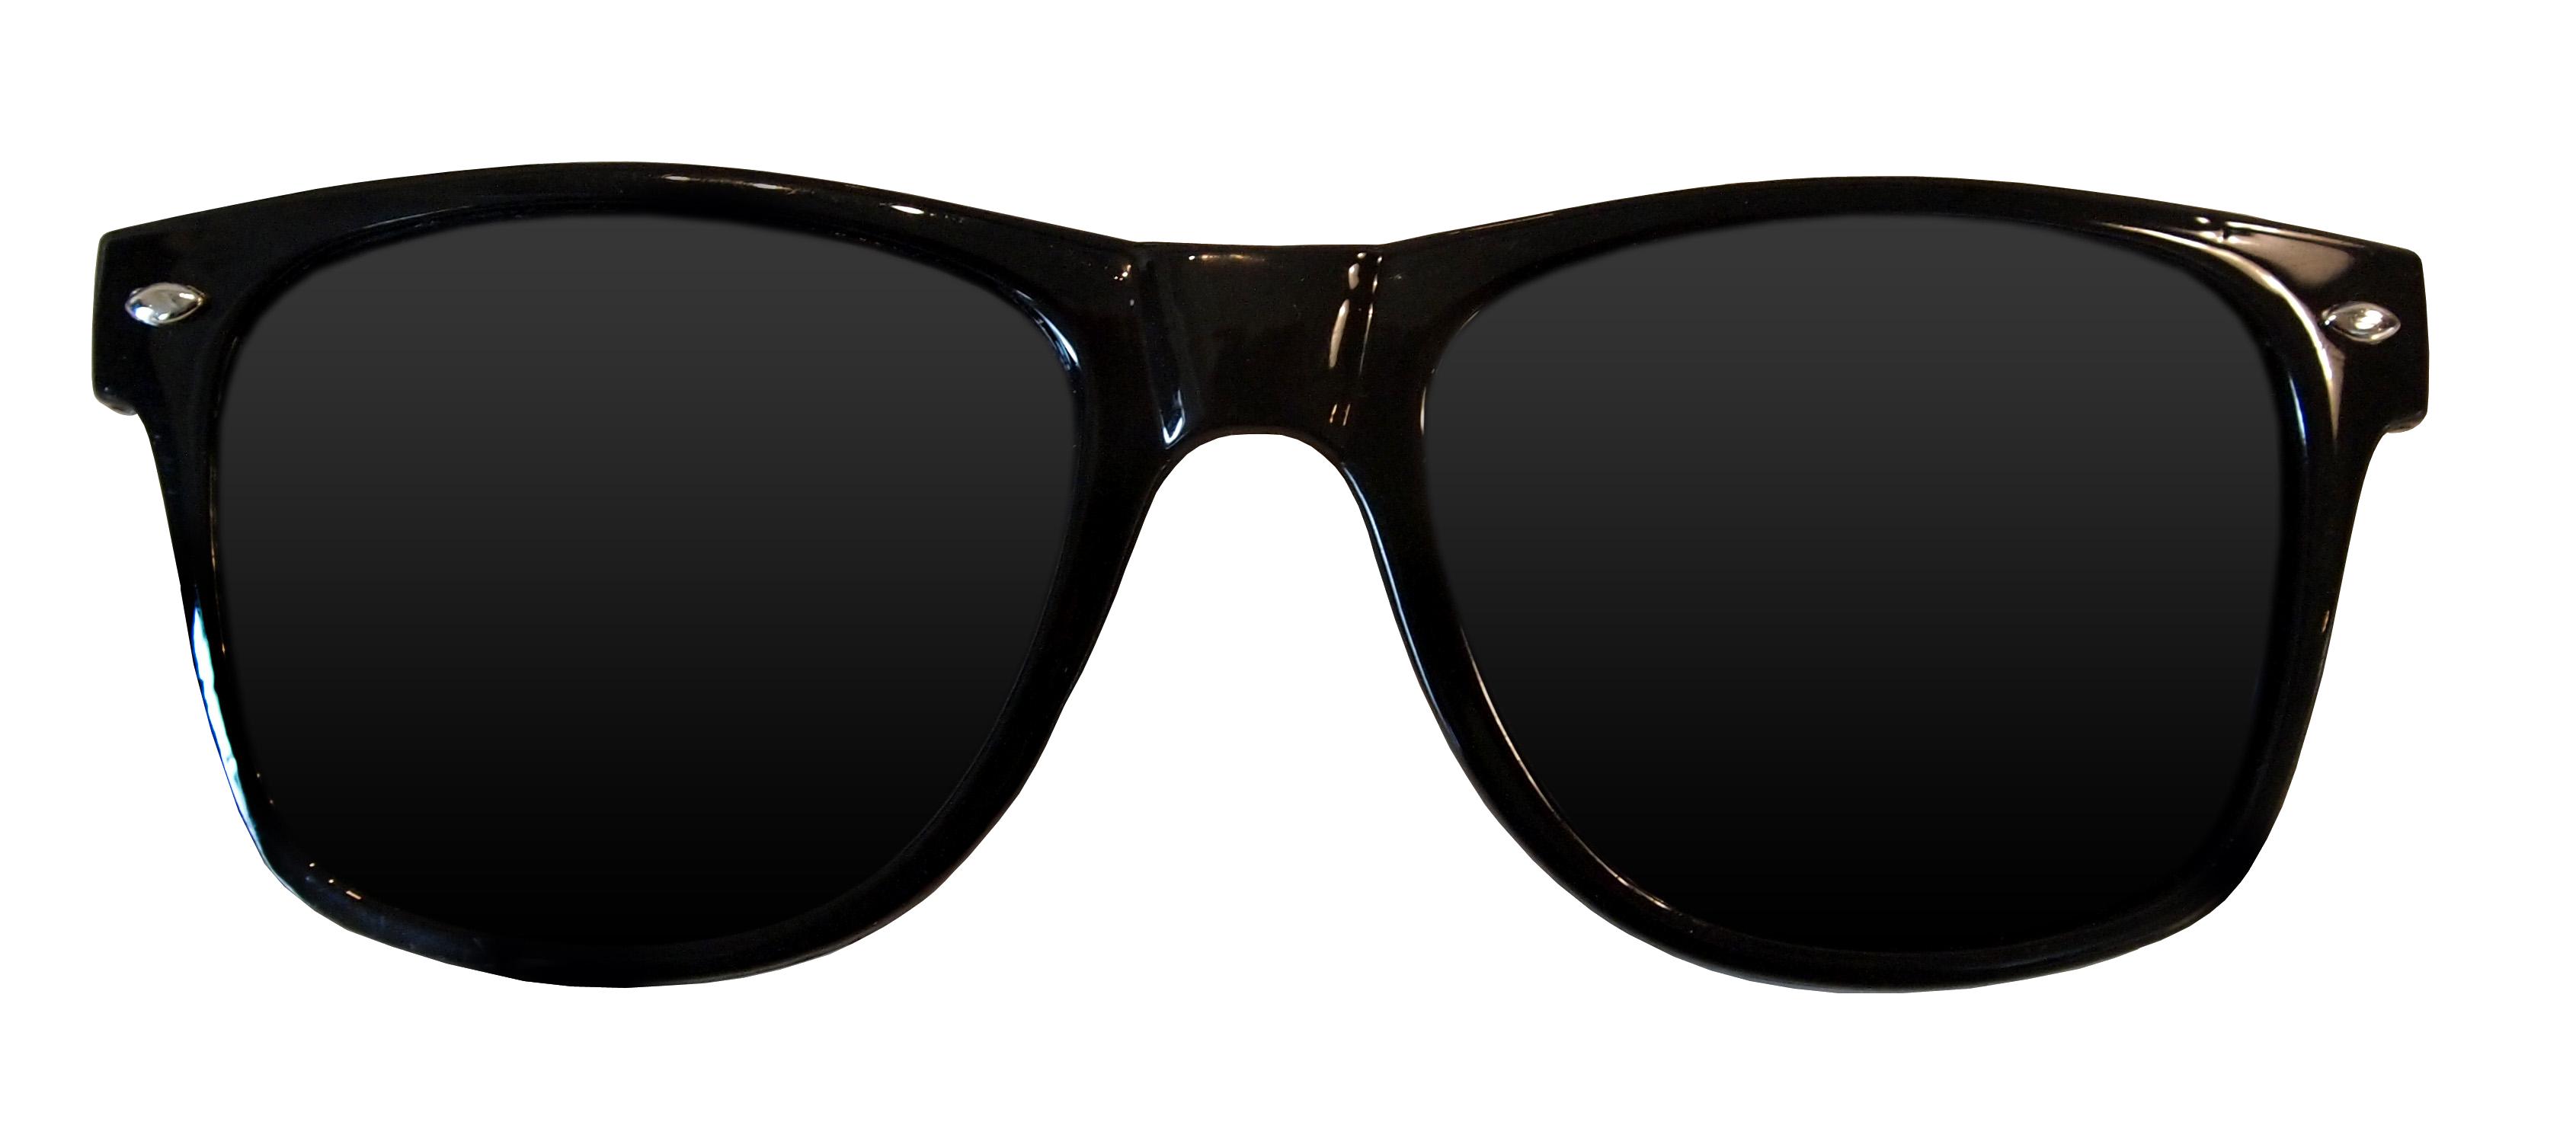 clip art transparent library Goggles clipart glares. Sunglass png images transparent